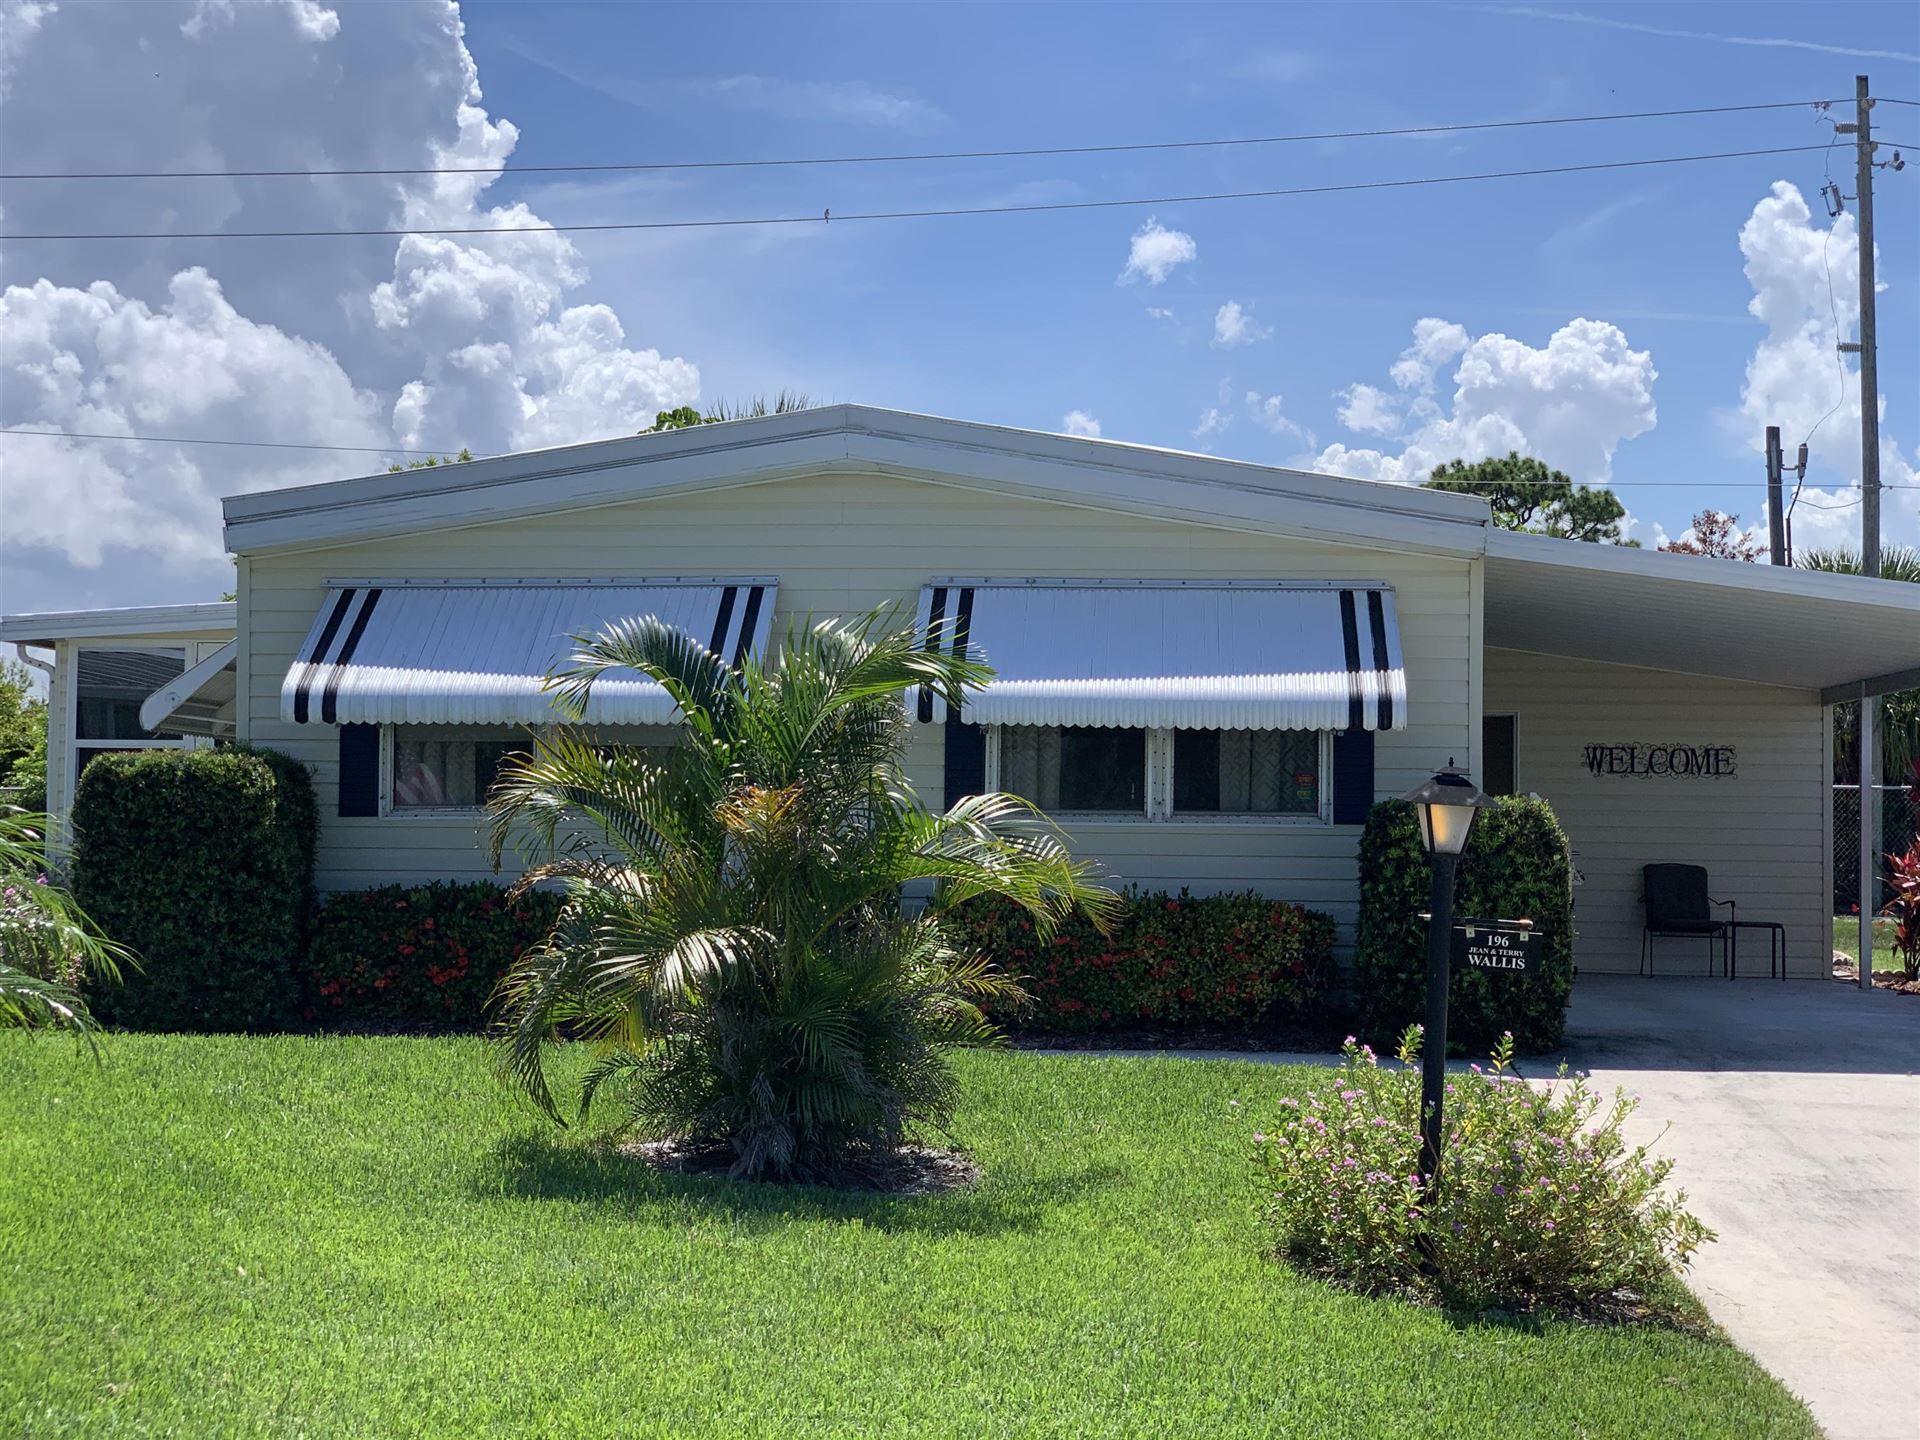 196 Emerald Drive NE, Jensen Beach, FL 34957 - #: RX-10634130